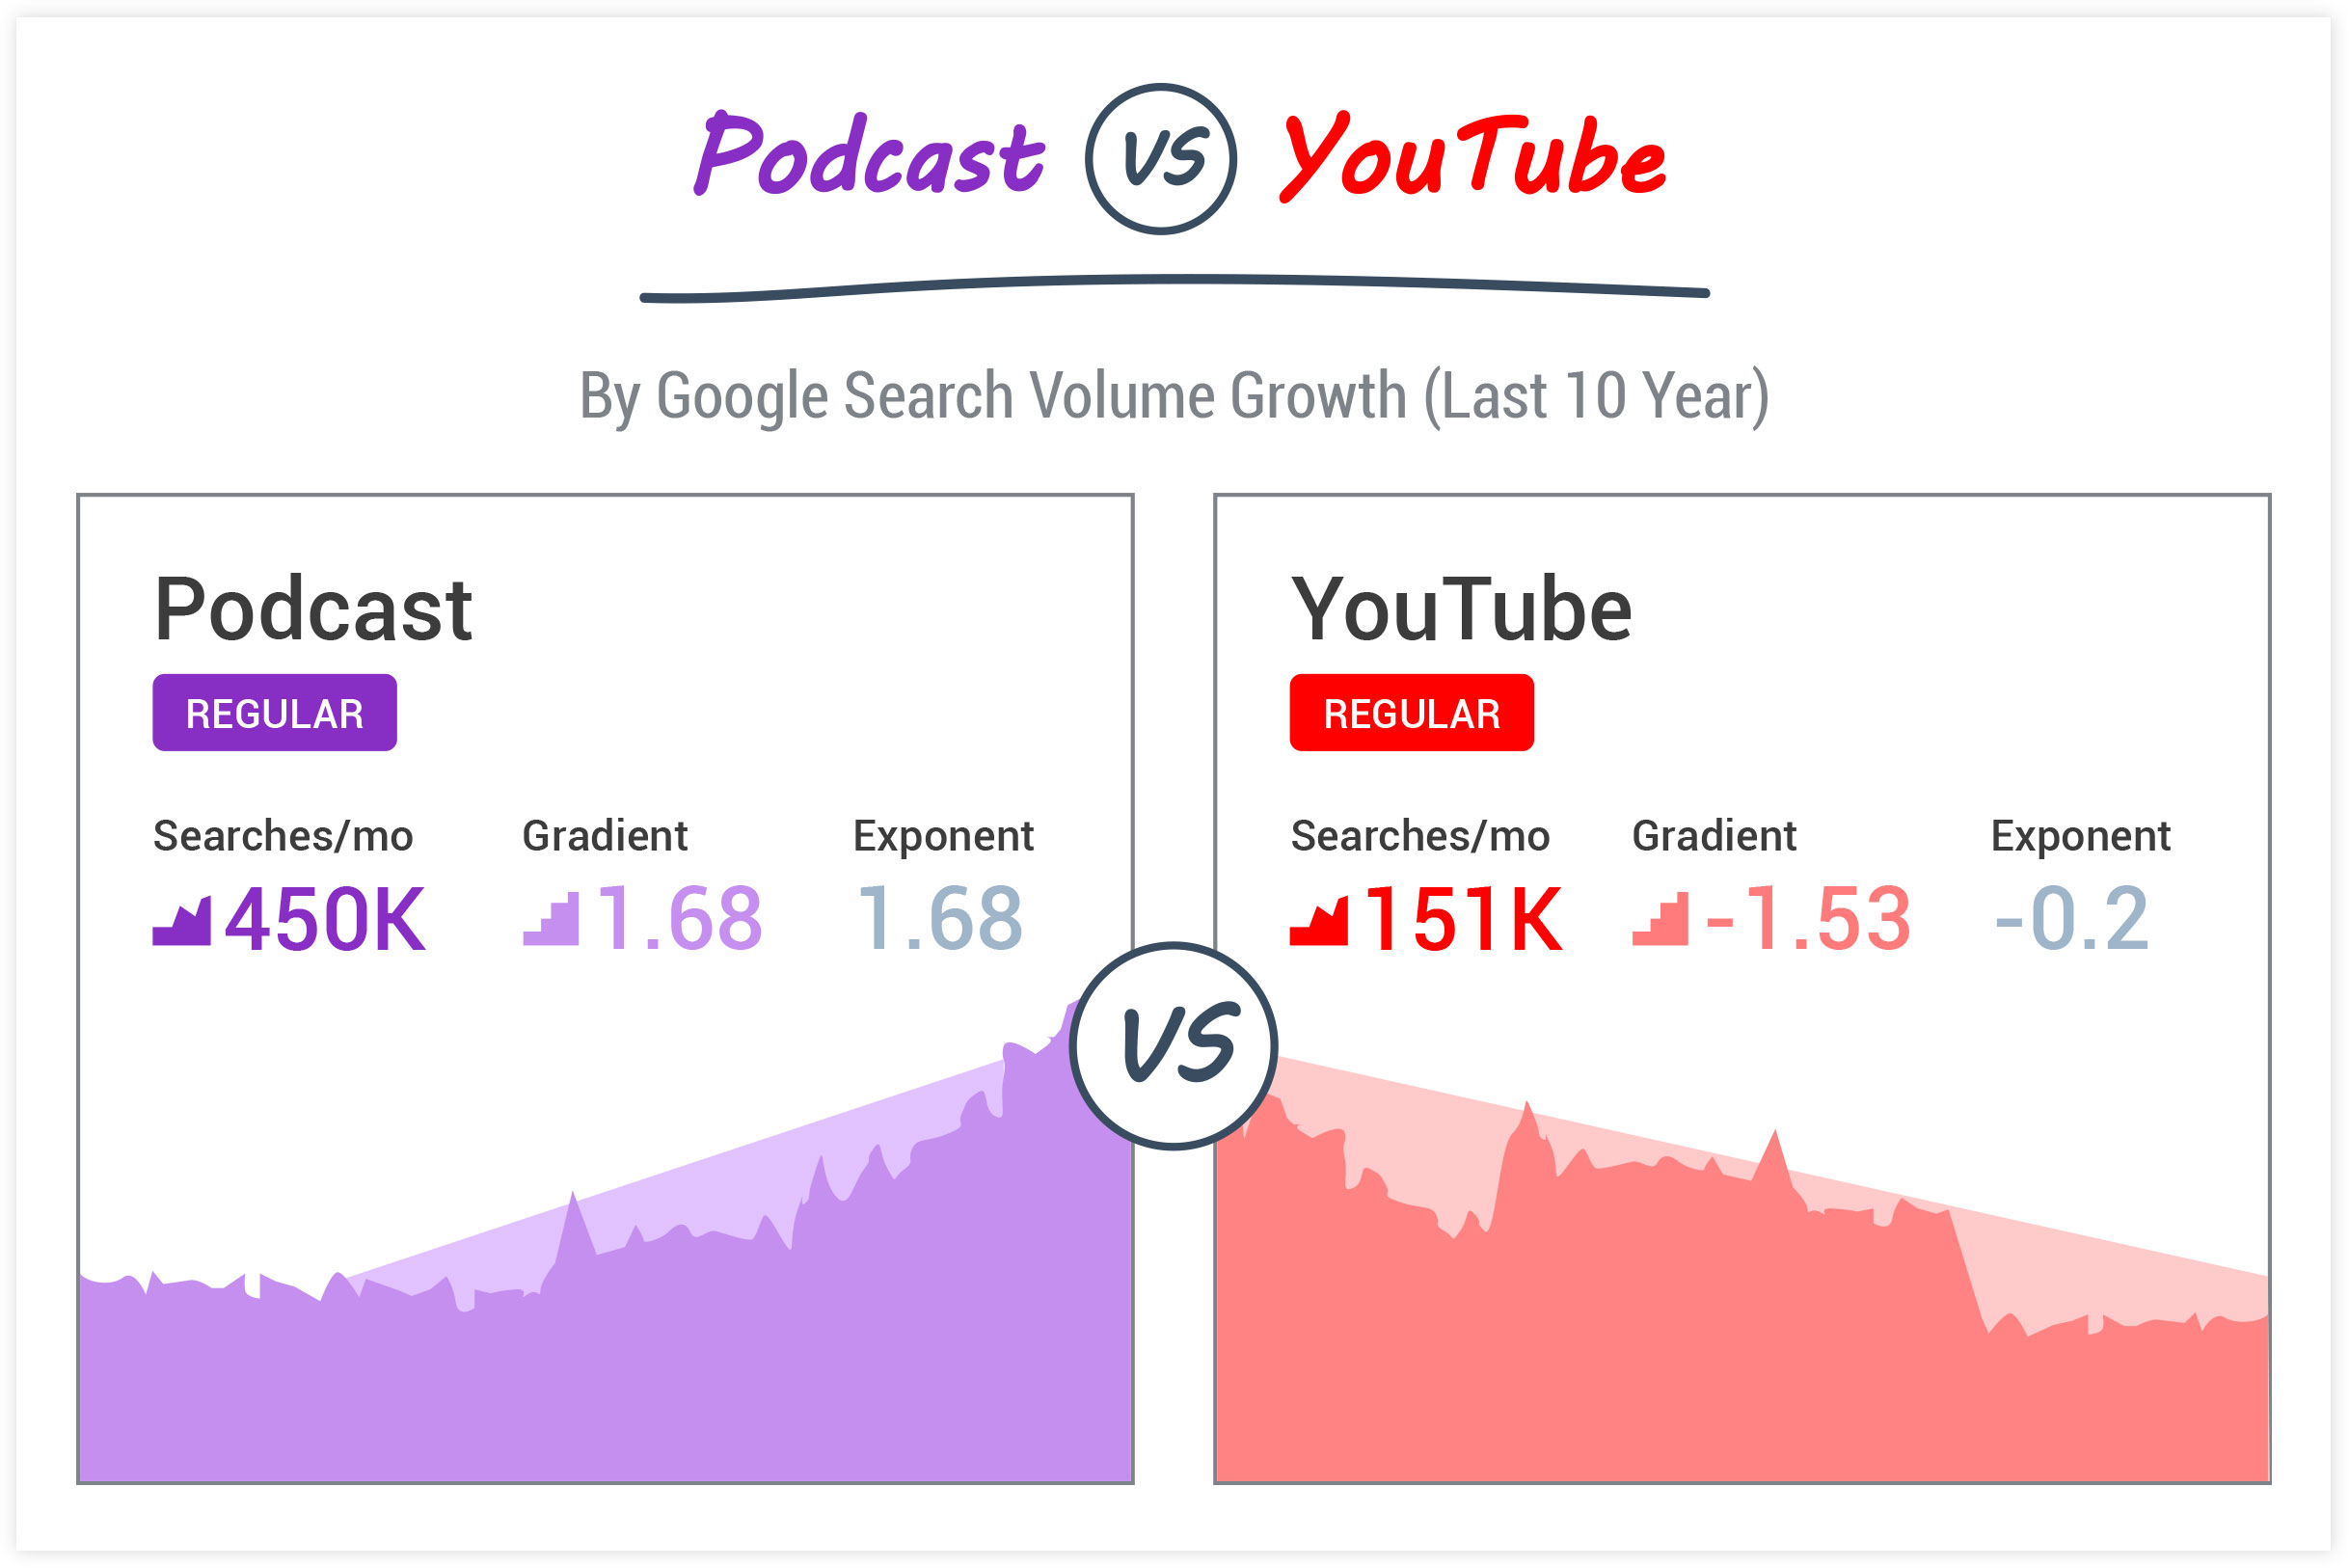 Exploding Topics Statistics: Podcast Marketing vs YouTube Marketing